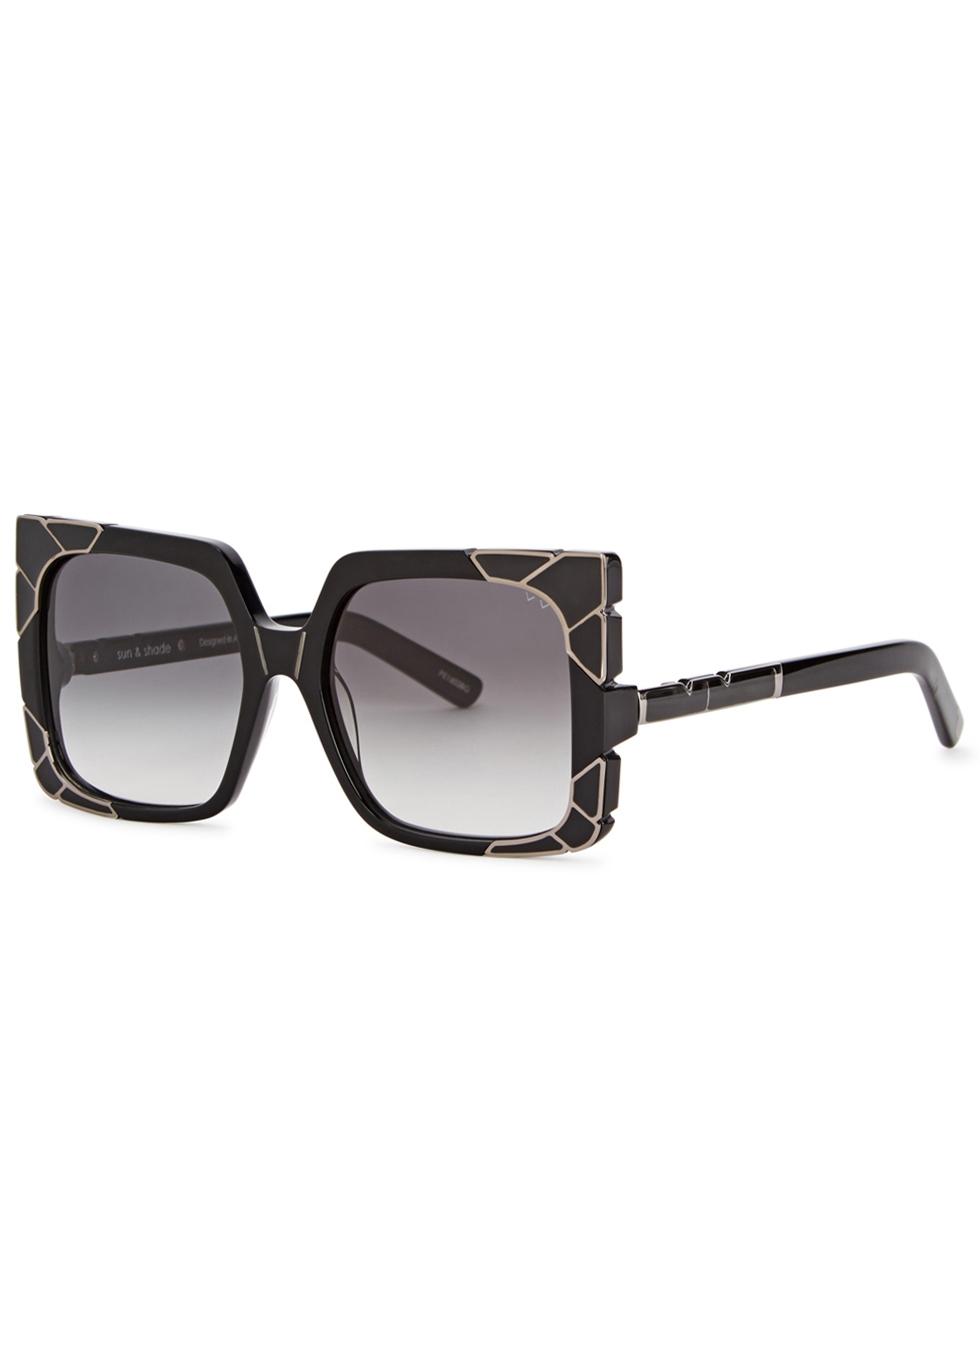 PARED EYEWEAR Sun & Shade Oversized Sunglasses in Black